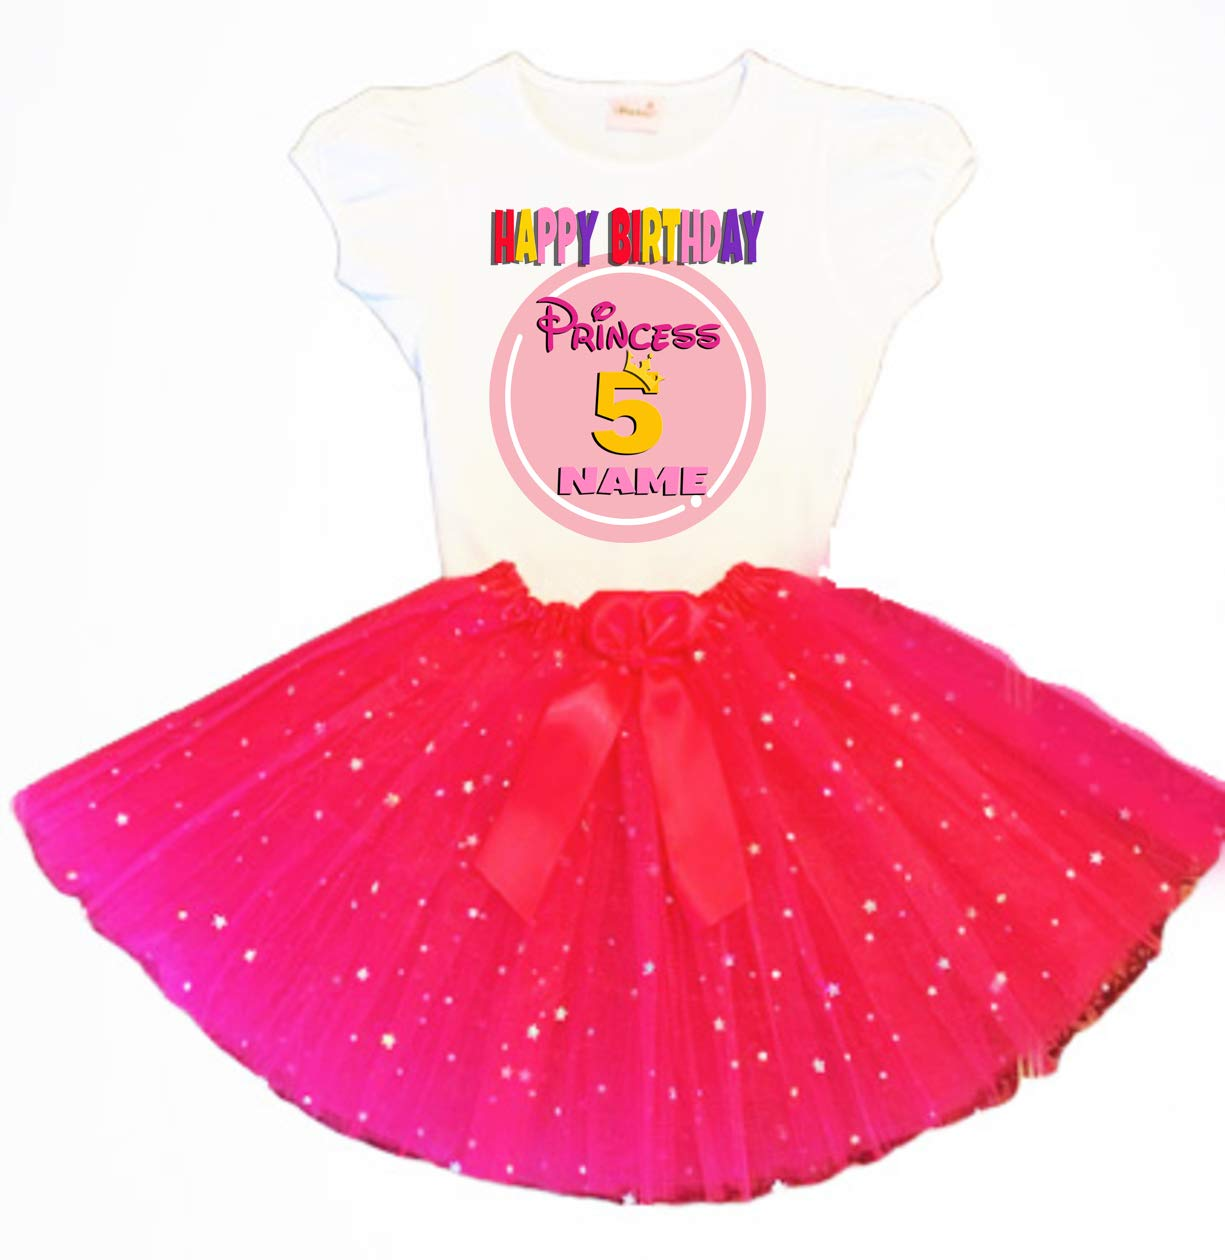 Princess Crown Birthday Tutu 5th Fuchsia 2021new shipping free shipping Dress Rapid rise Tu Party